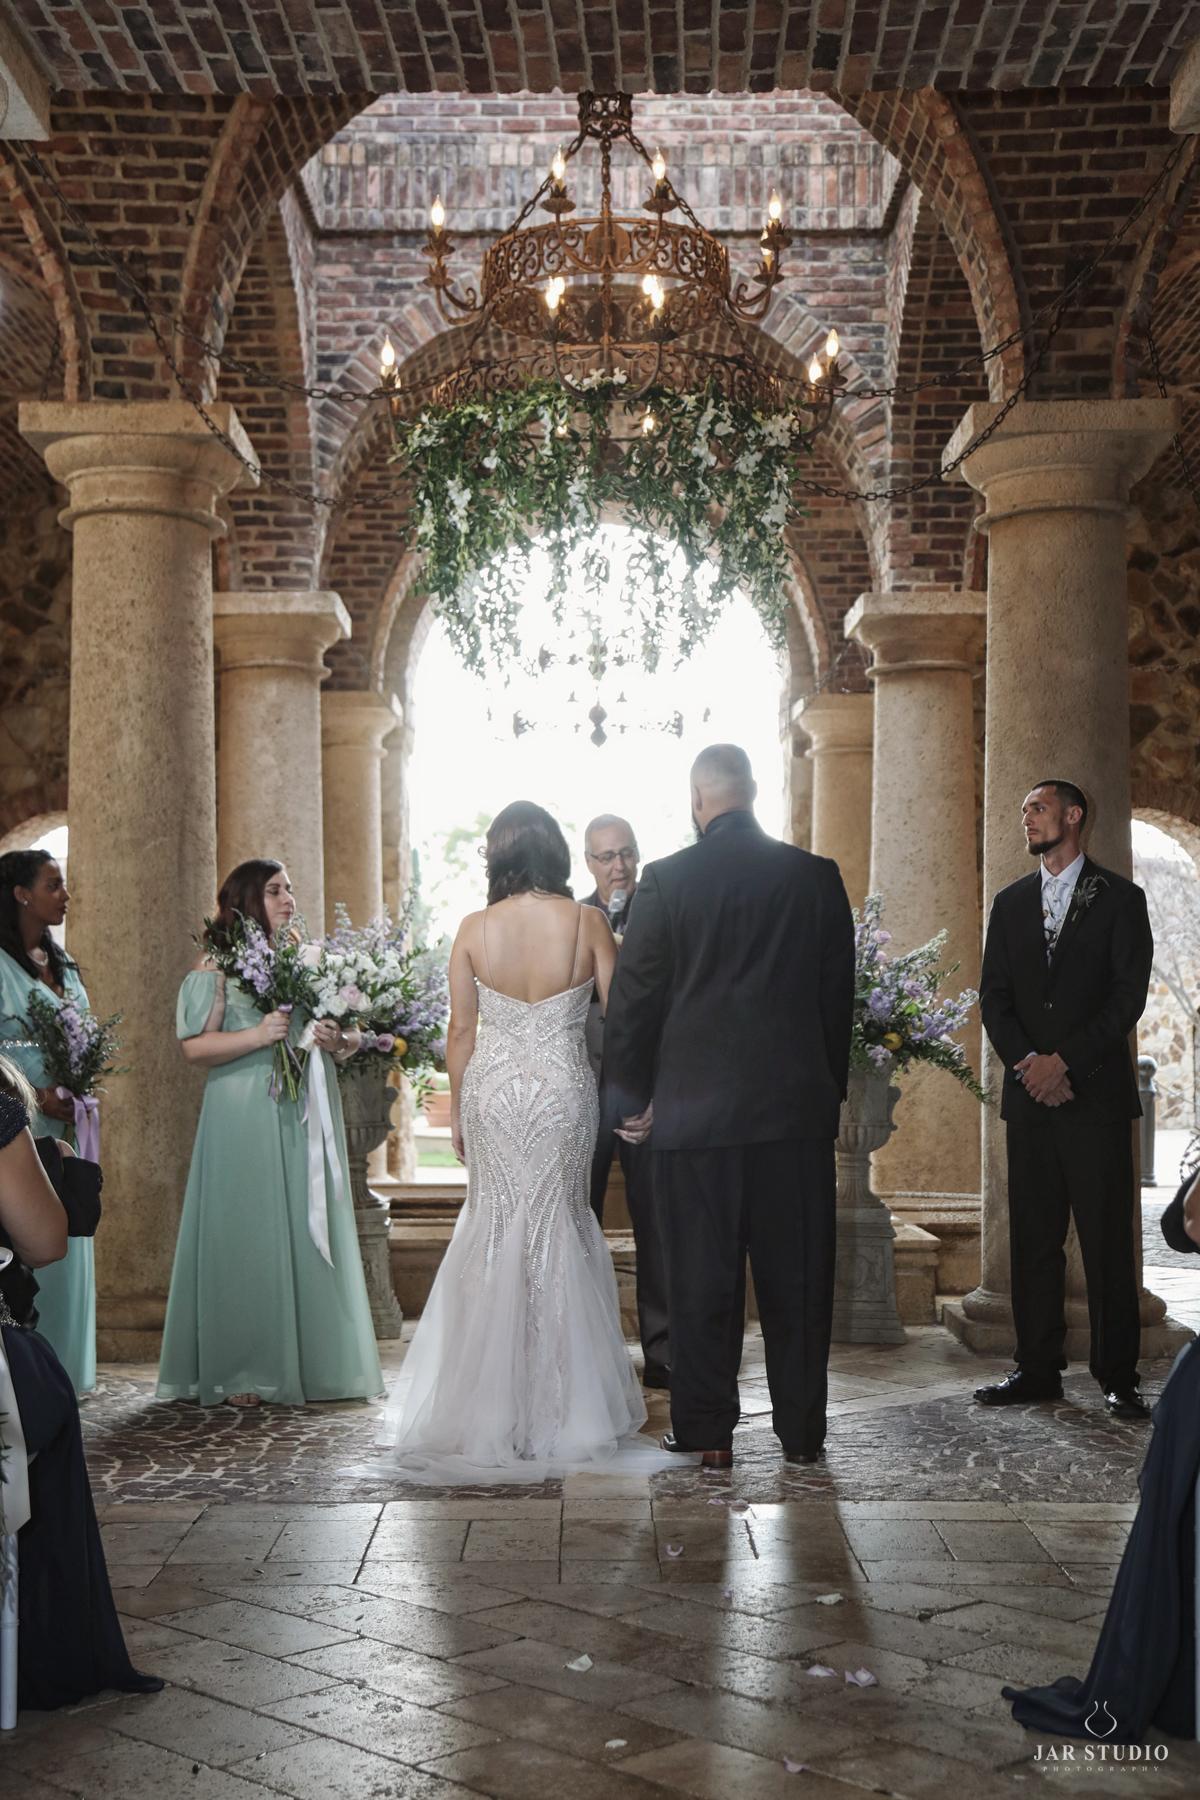 12-real-wedding-ceremony-bella-collina-fl-photographer.jpg